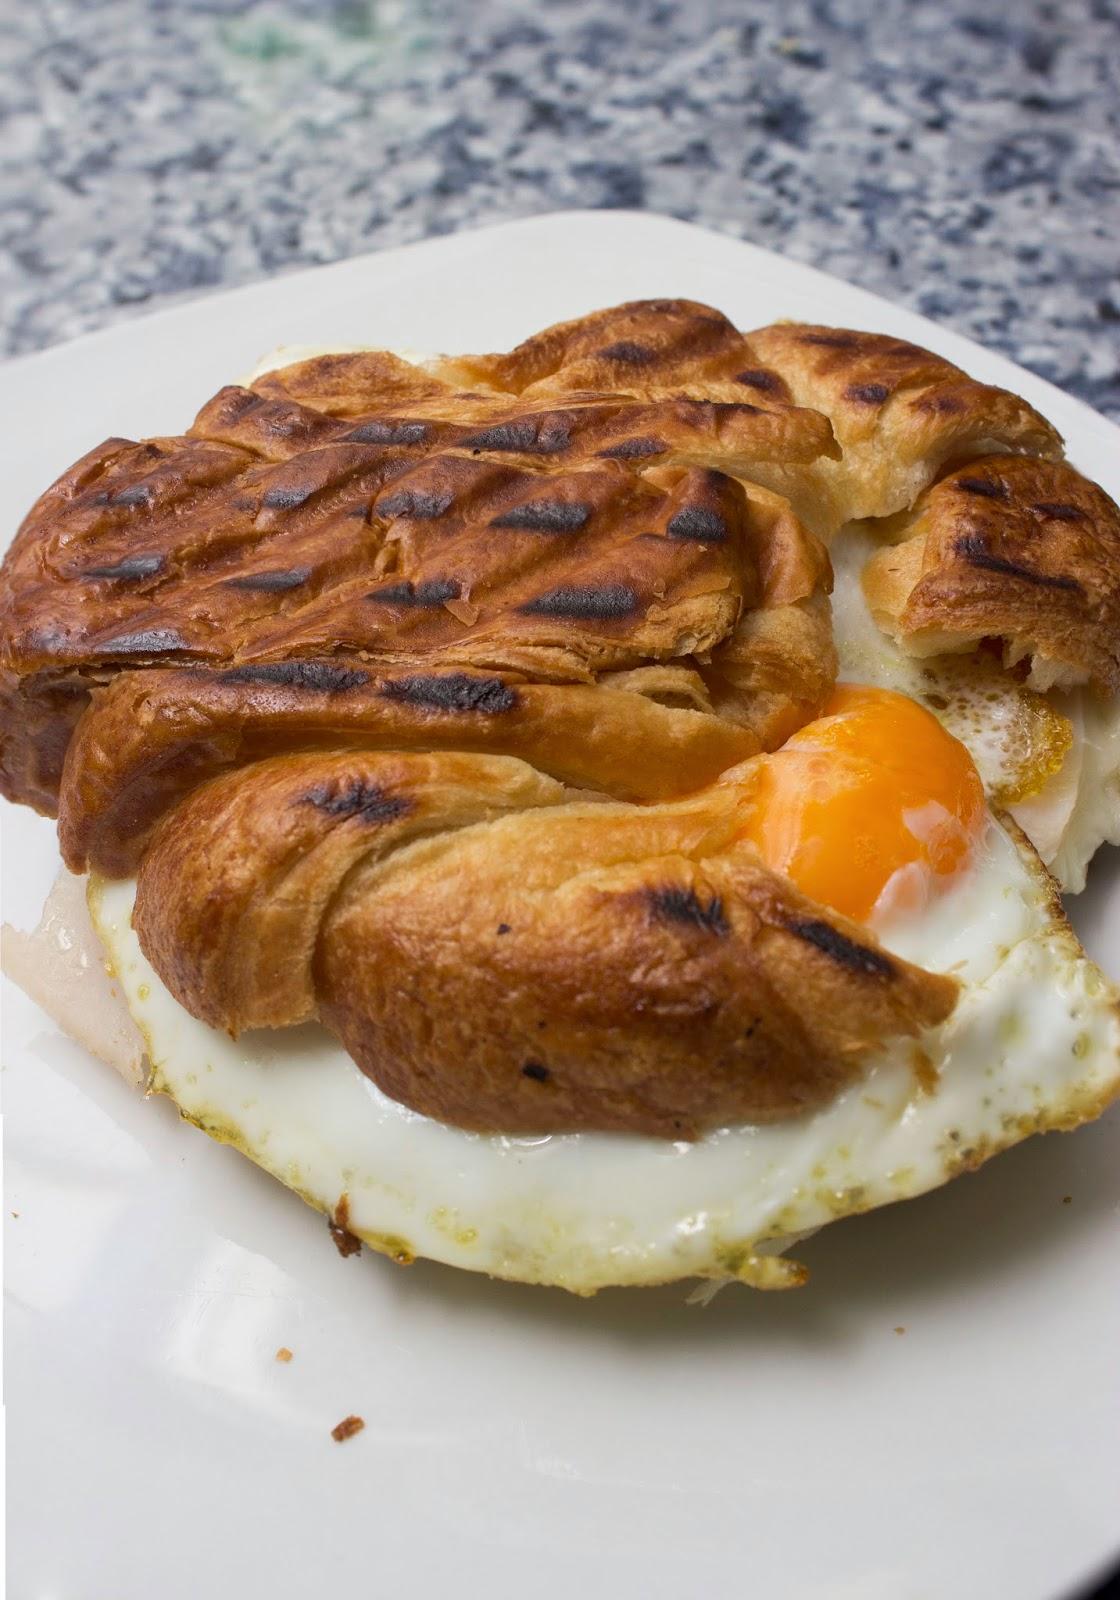 http://elbauldelasdelicias.blogspot.com.es/2014/02/croissant-mixto-huevo.html